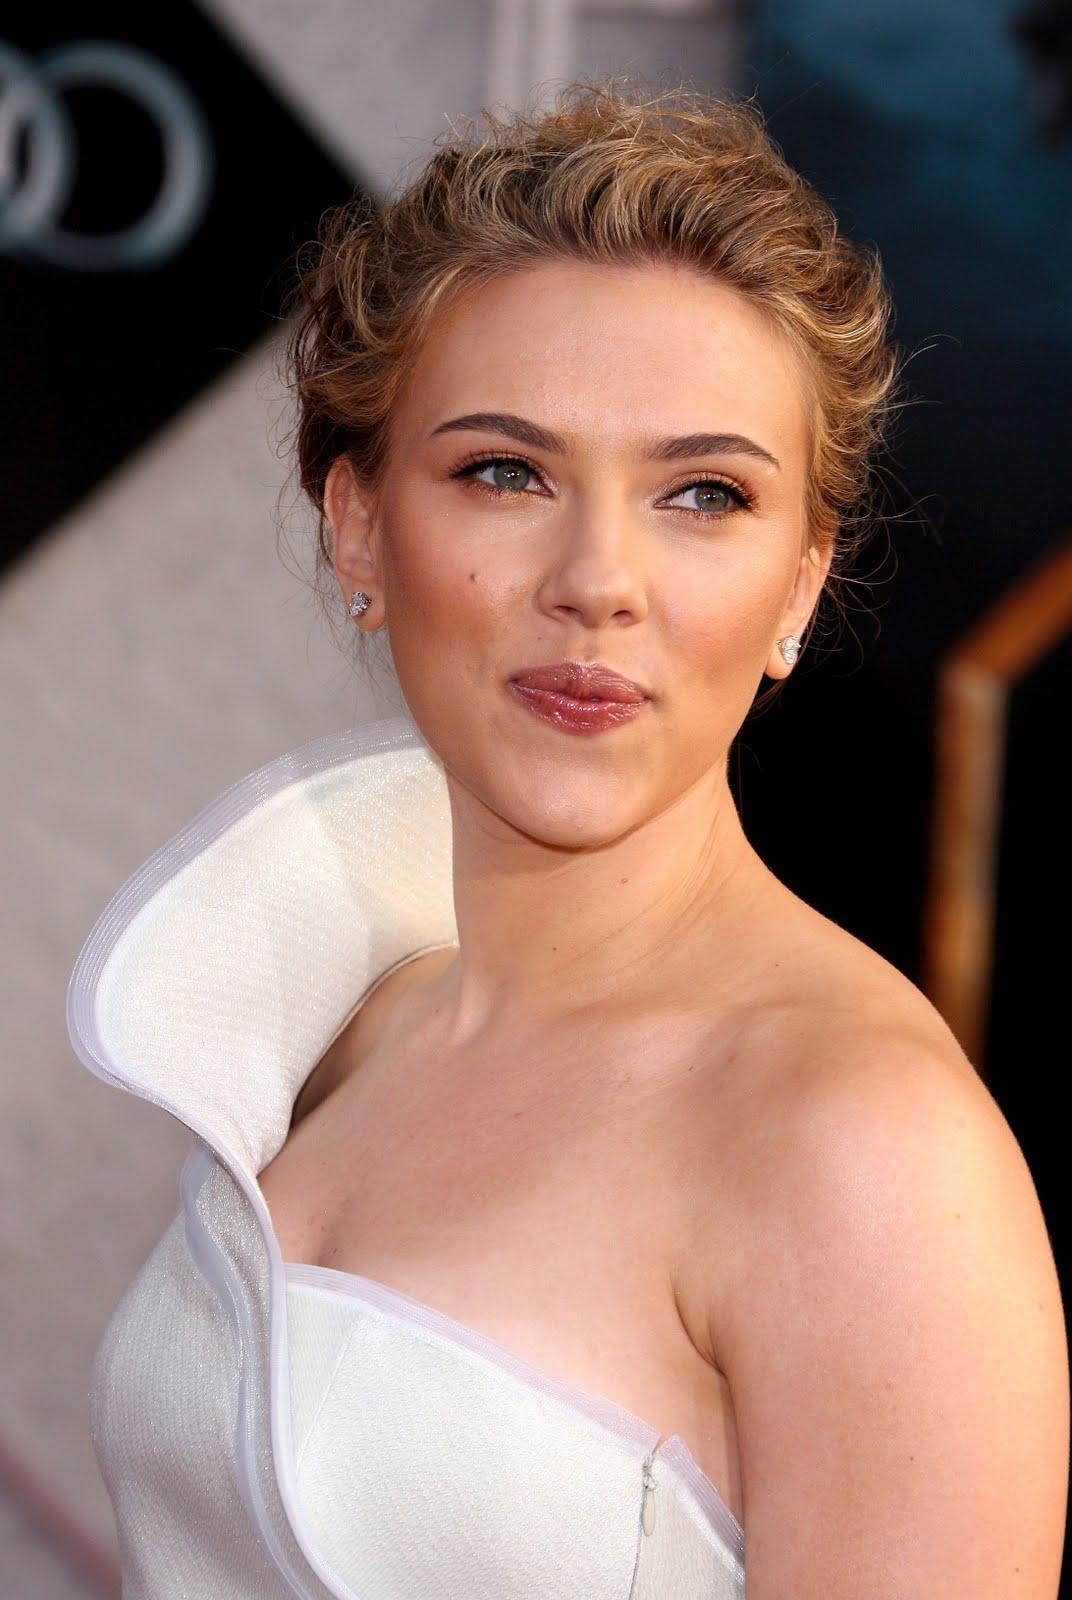 http://2.bp.blogspot.com/-7NOW6gPOjzk/TgRmdg0w4_I/AAAAAAAAFDc/mDURDFbSDYY/s1600/Scarlett-Johansson-4.jpg